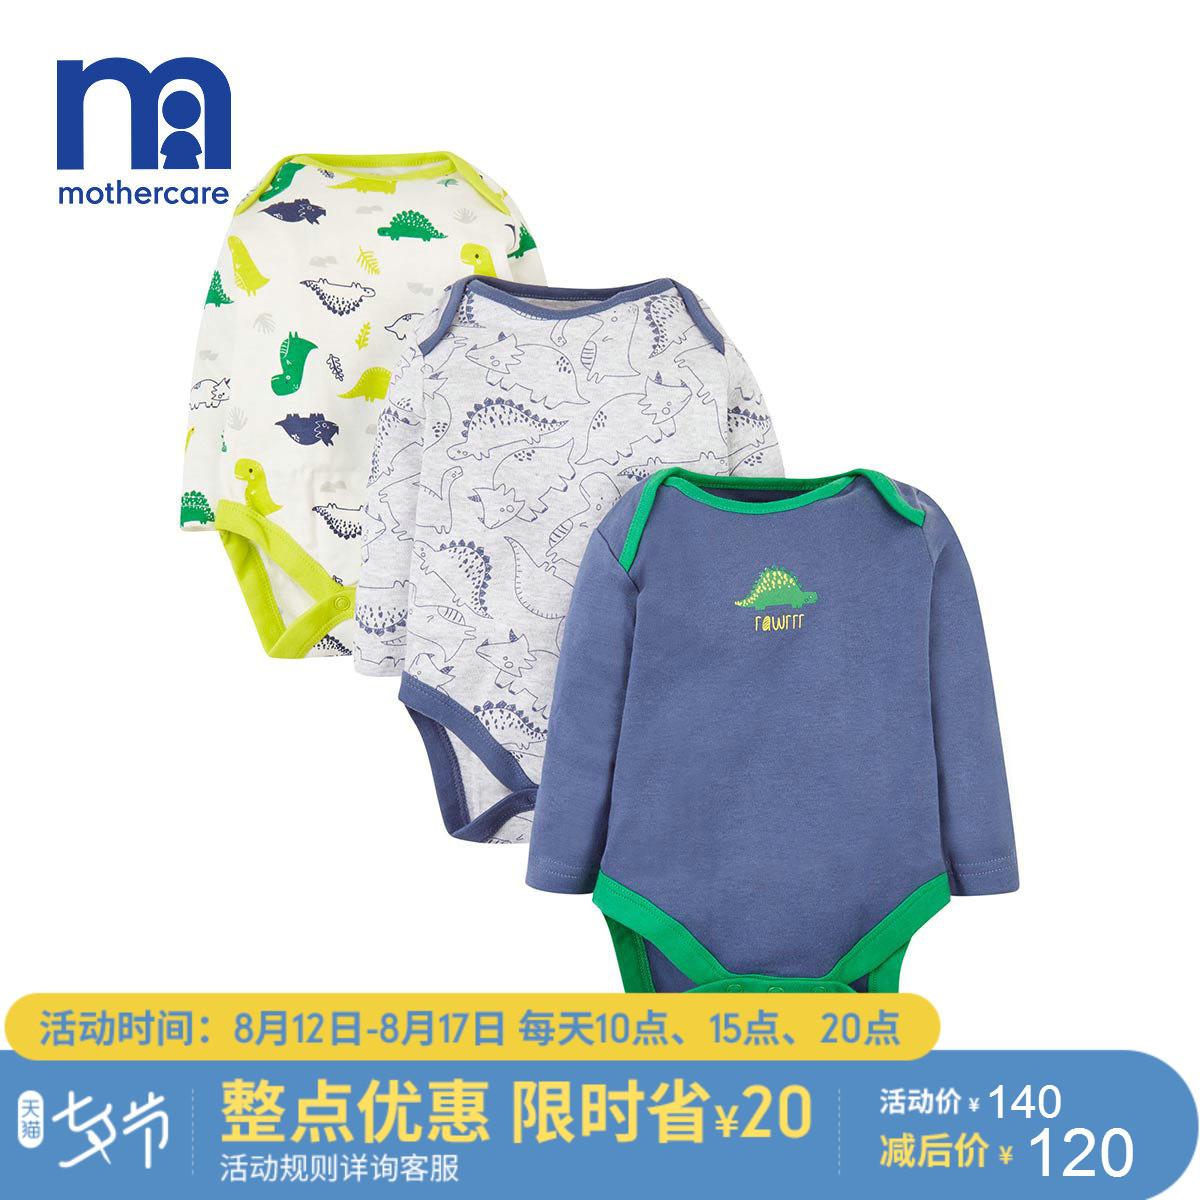 mothercare婴儿春秋装新生儿宝宝棉质长袖款侏罗纪图案连体衣哈衣